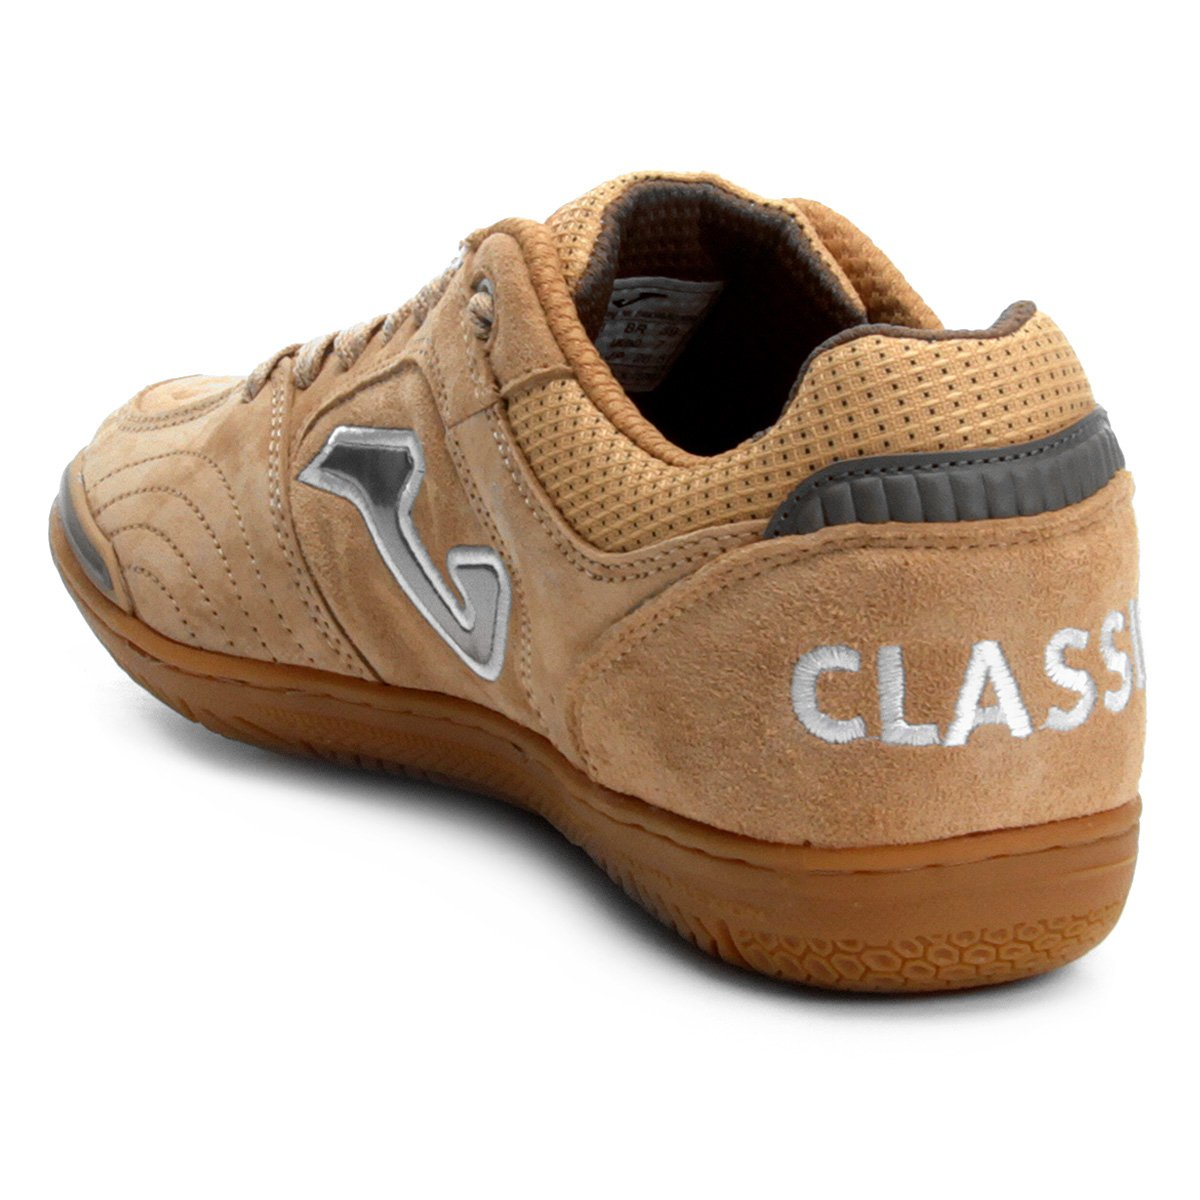 Chuteira Futsal Joma Classic Nobuck IN - Bege - Compre Agora  f4dd2a7d08414